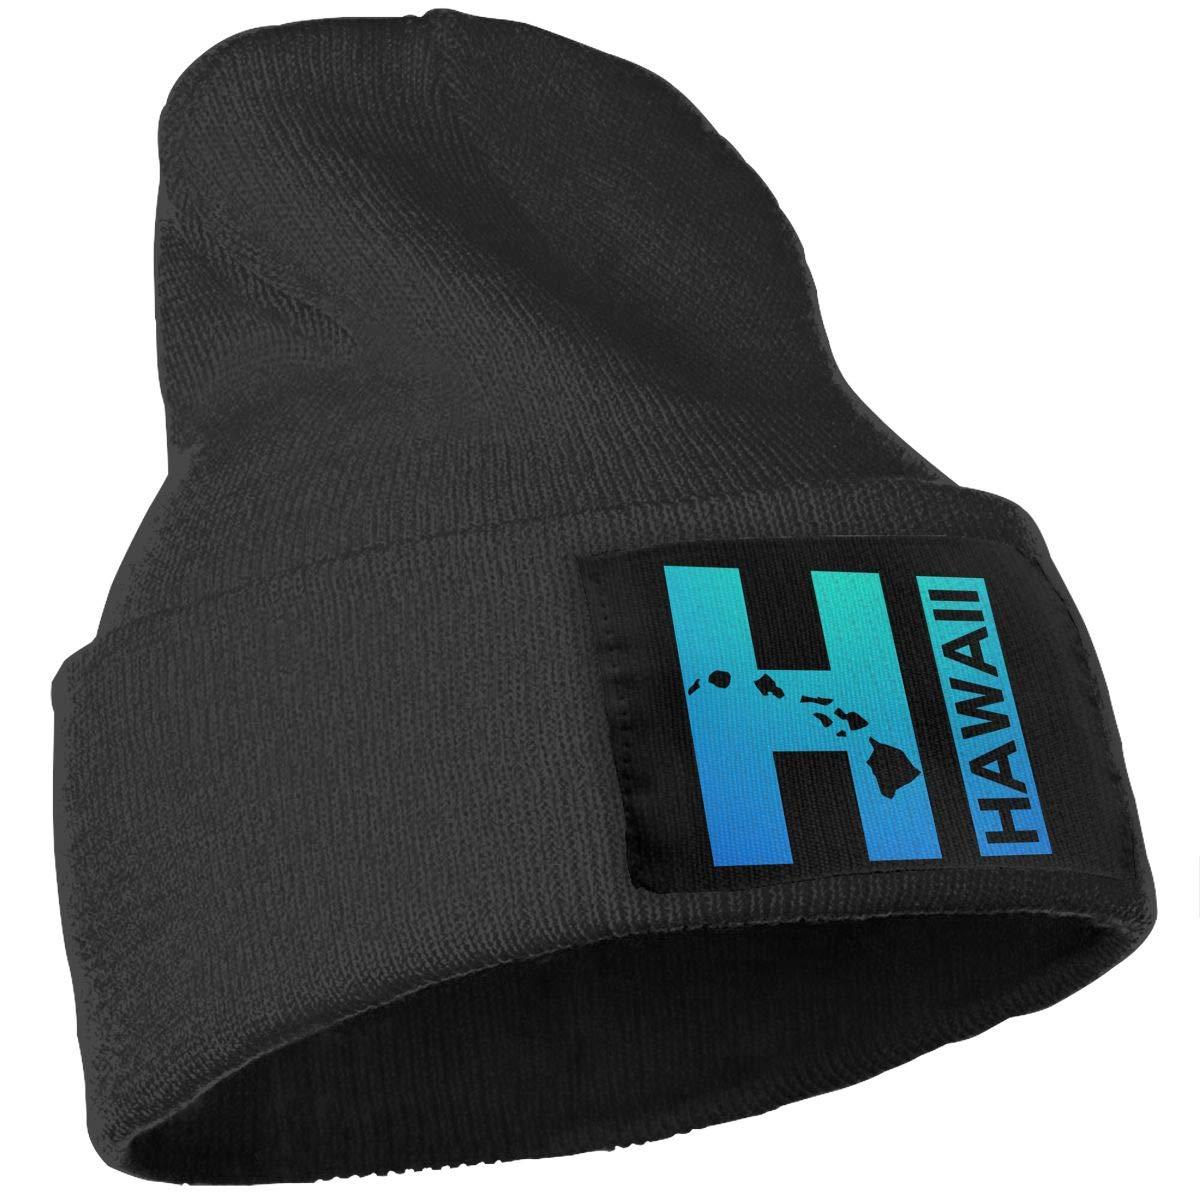 Hawaii HI Islands American Men /& Women Knit Hats Stretchy /& Soft Beanie Cap Hat Beanie